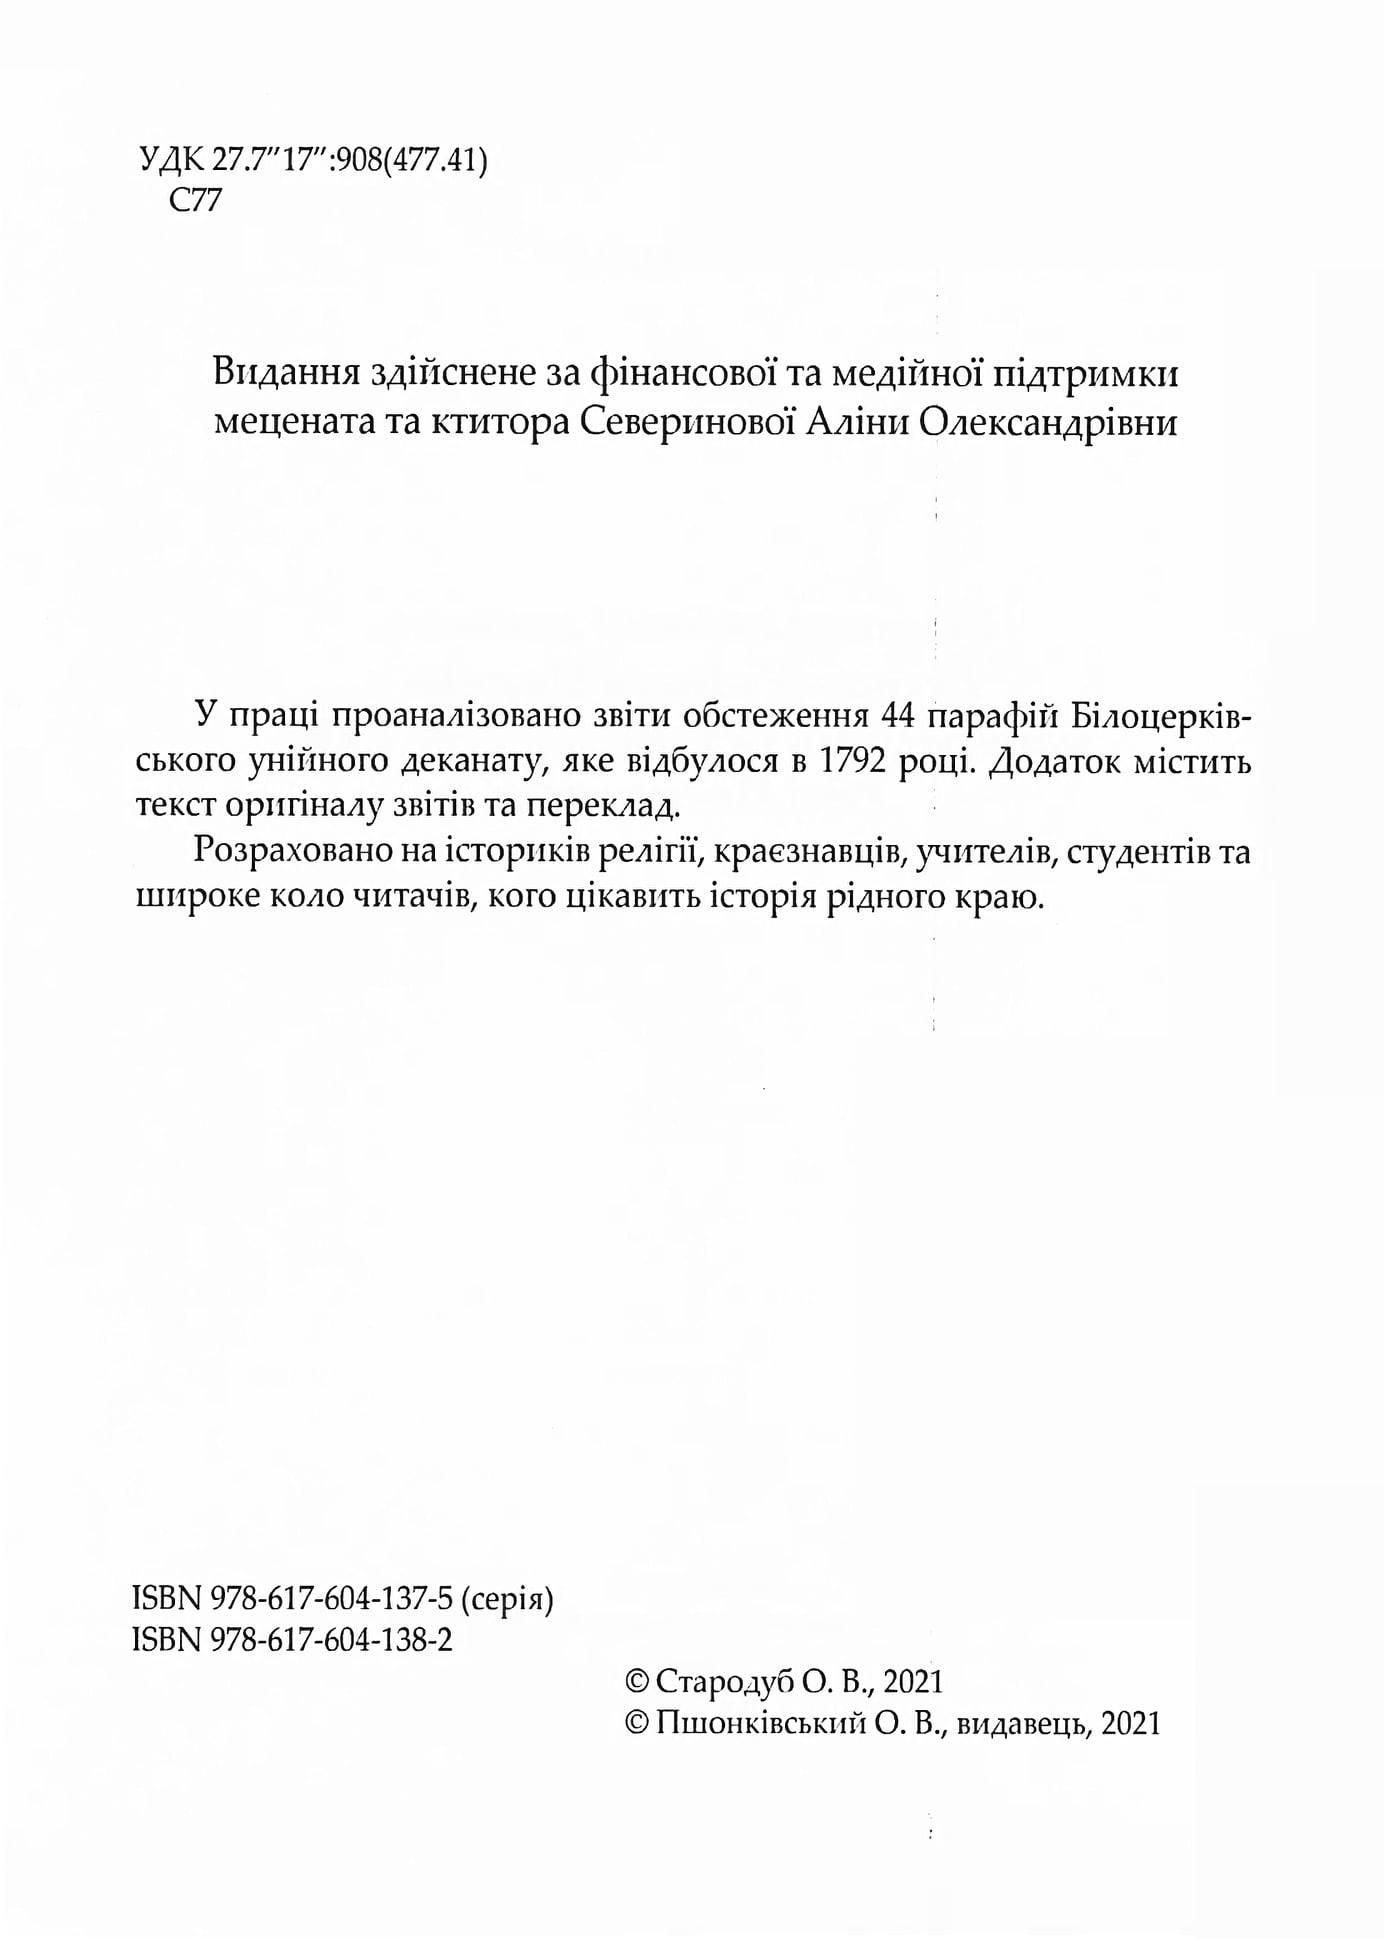 https://i6.imageban.ru/out/2021/09/23/4b73a0fa151c6c2c0faf64087ce15051.jpg